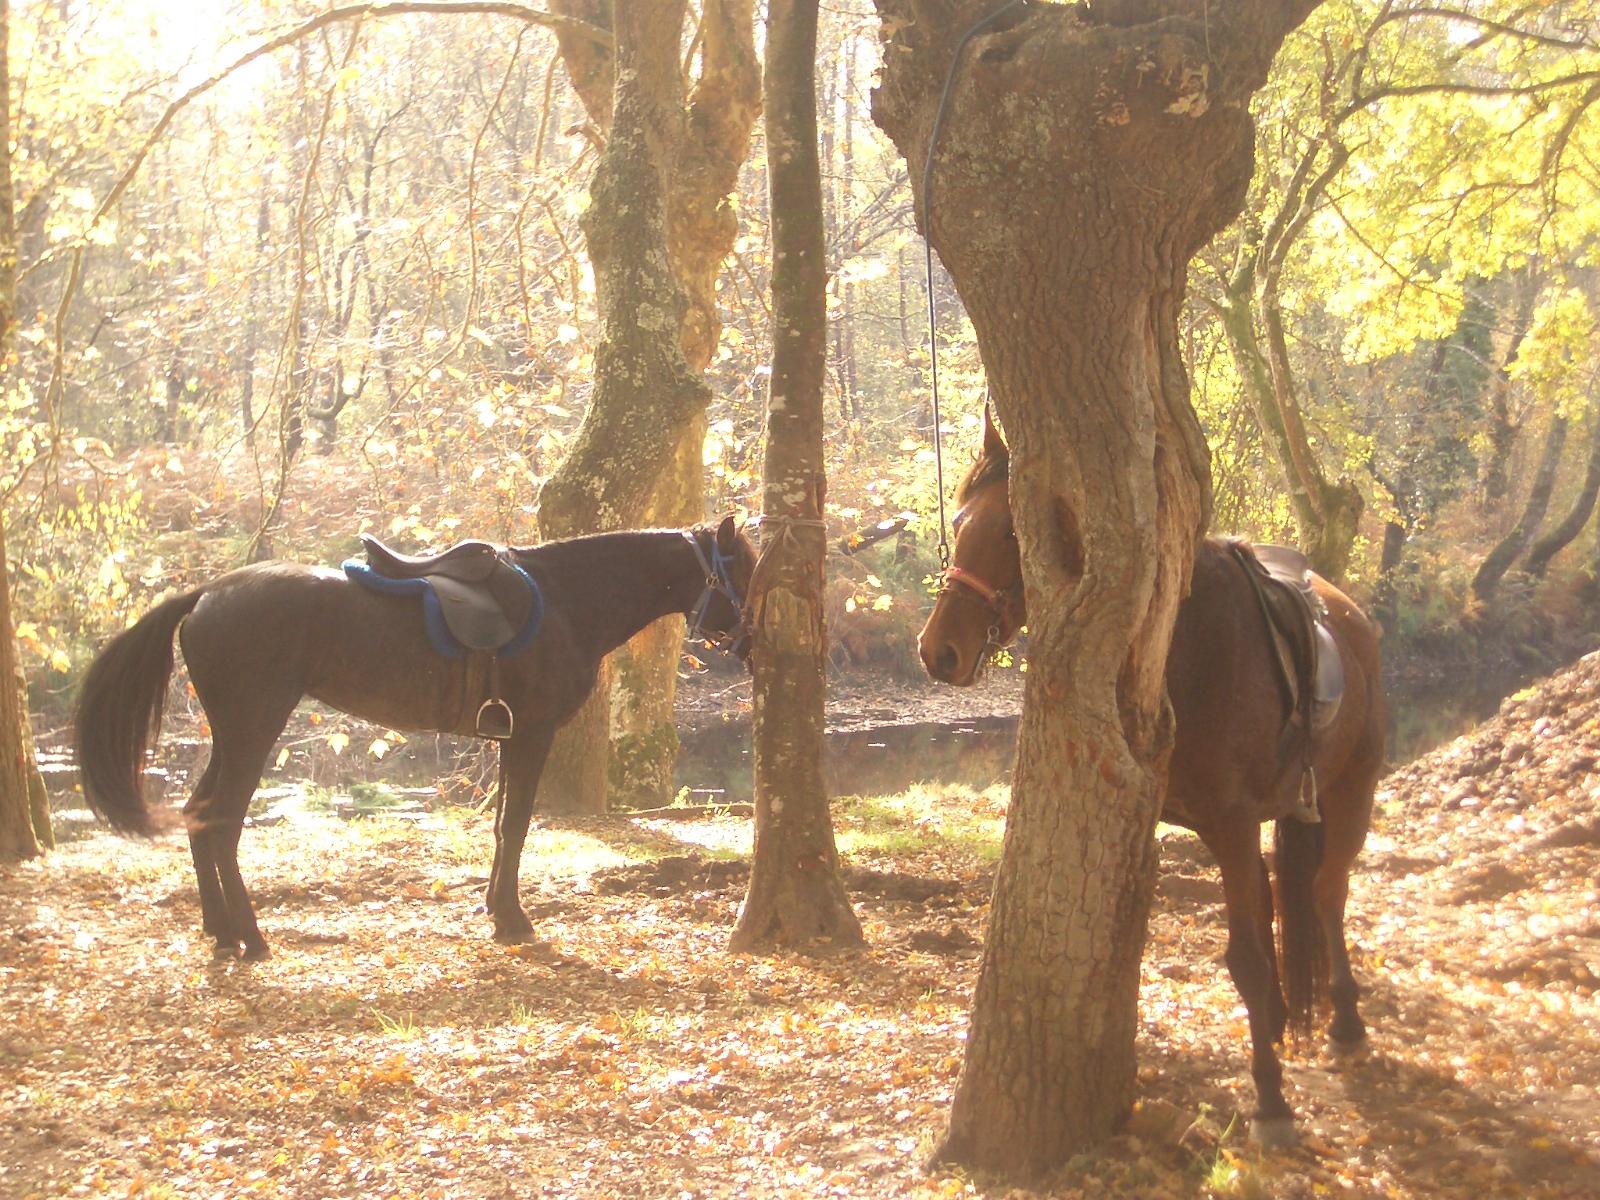 Rutas a caballo en Galicia . Caballos para nivel iniciación , medio y avanzado